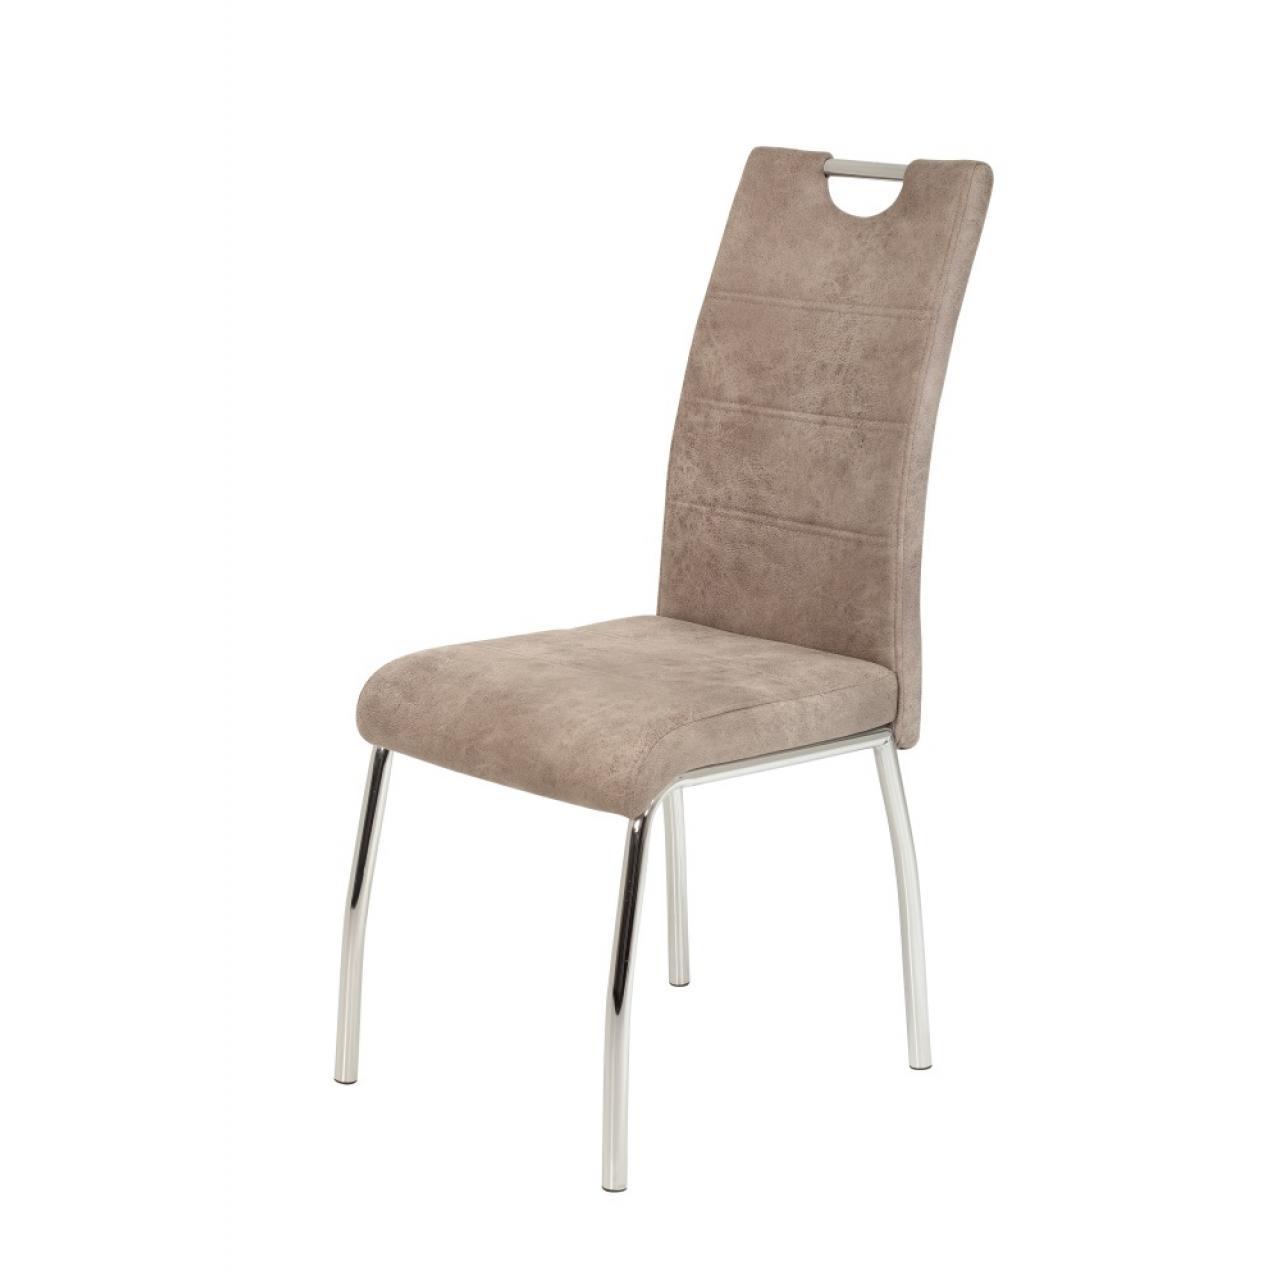 4-Fuß Stuhl Susi - Beige